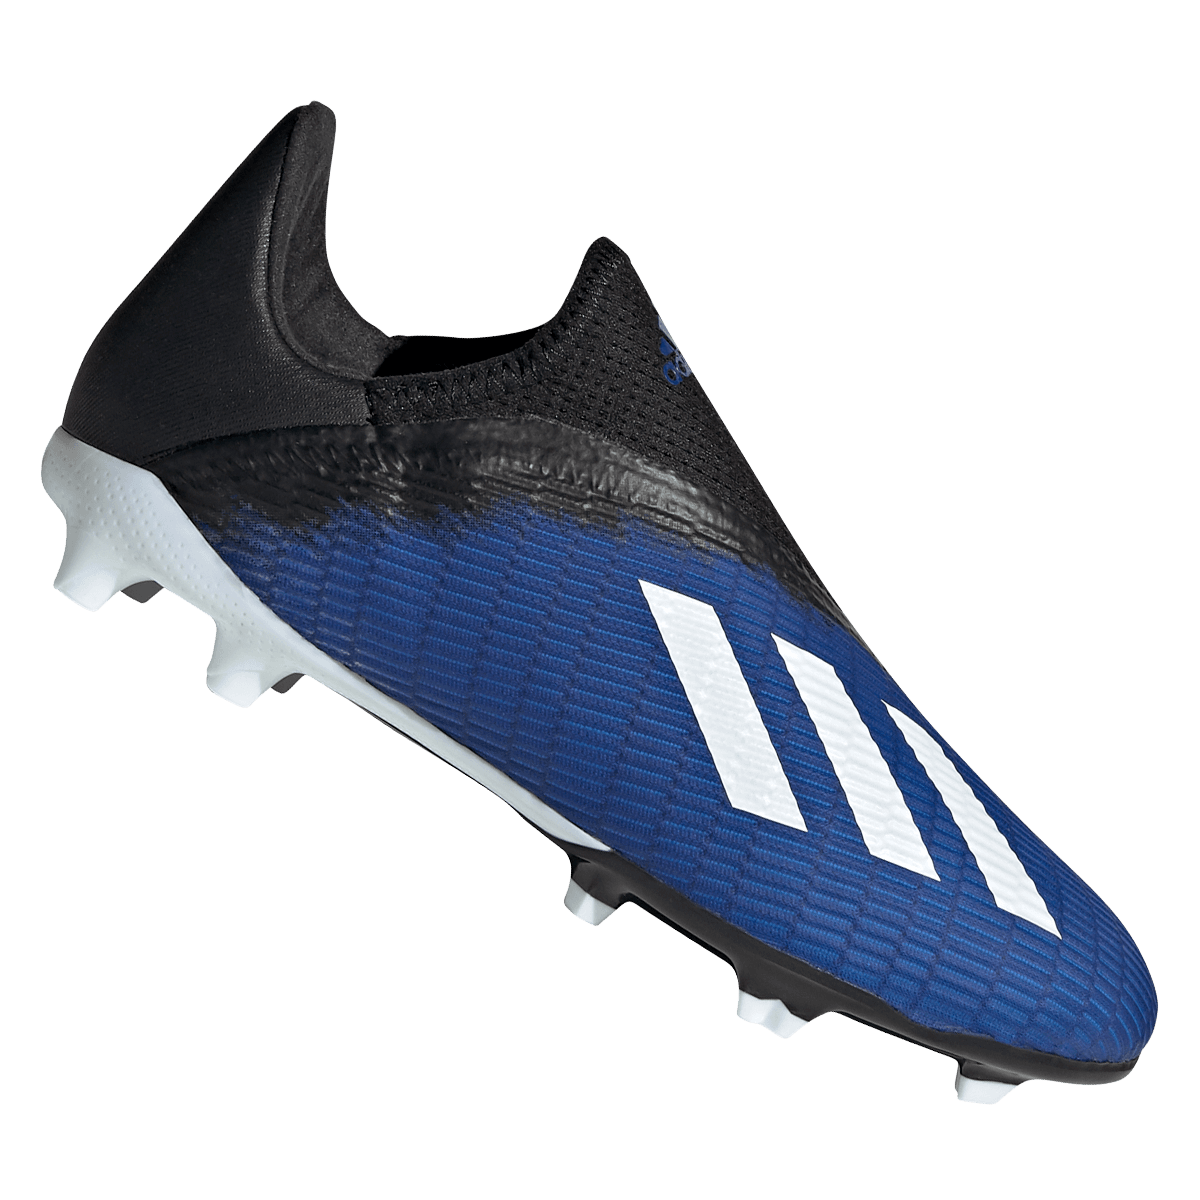 adidas Kinder Fußballschuh X 19.3 LL FG J dunkelblauschwarz